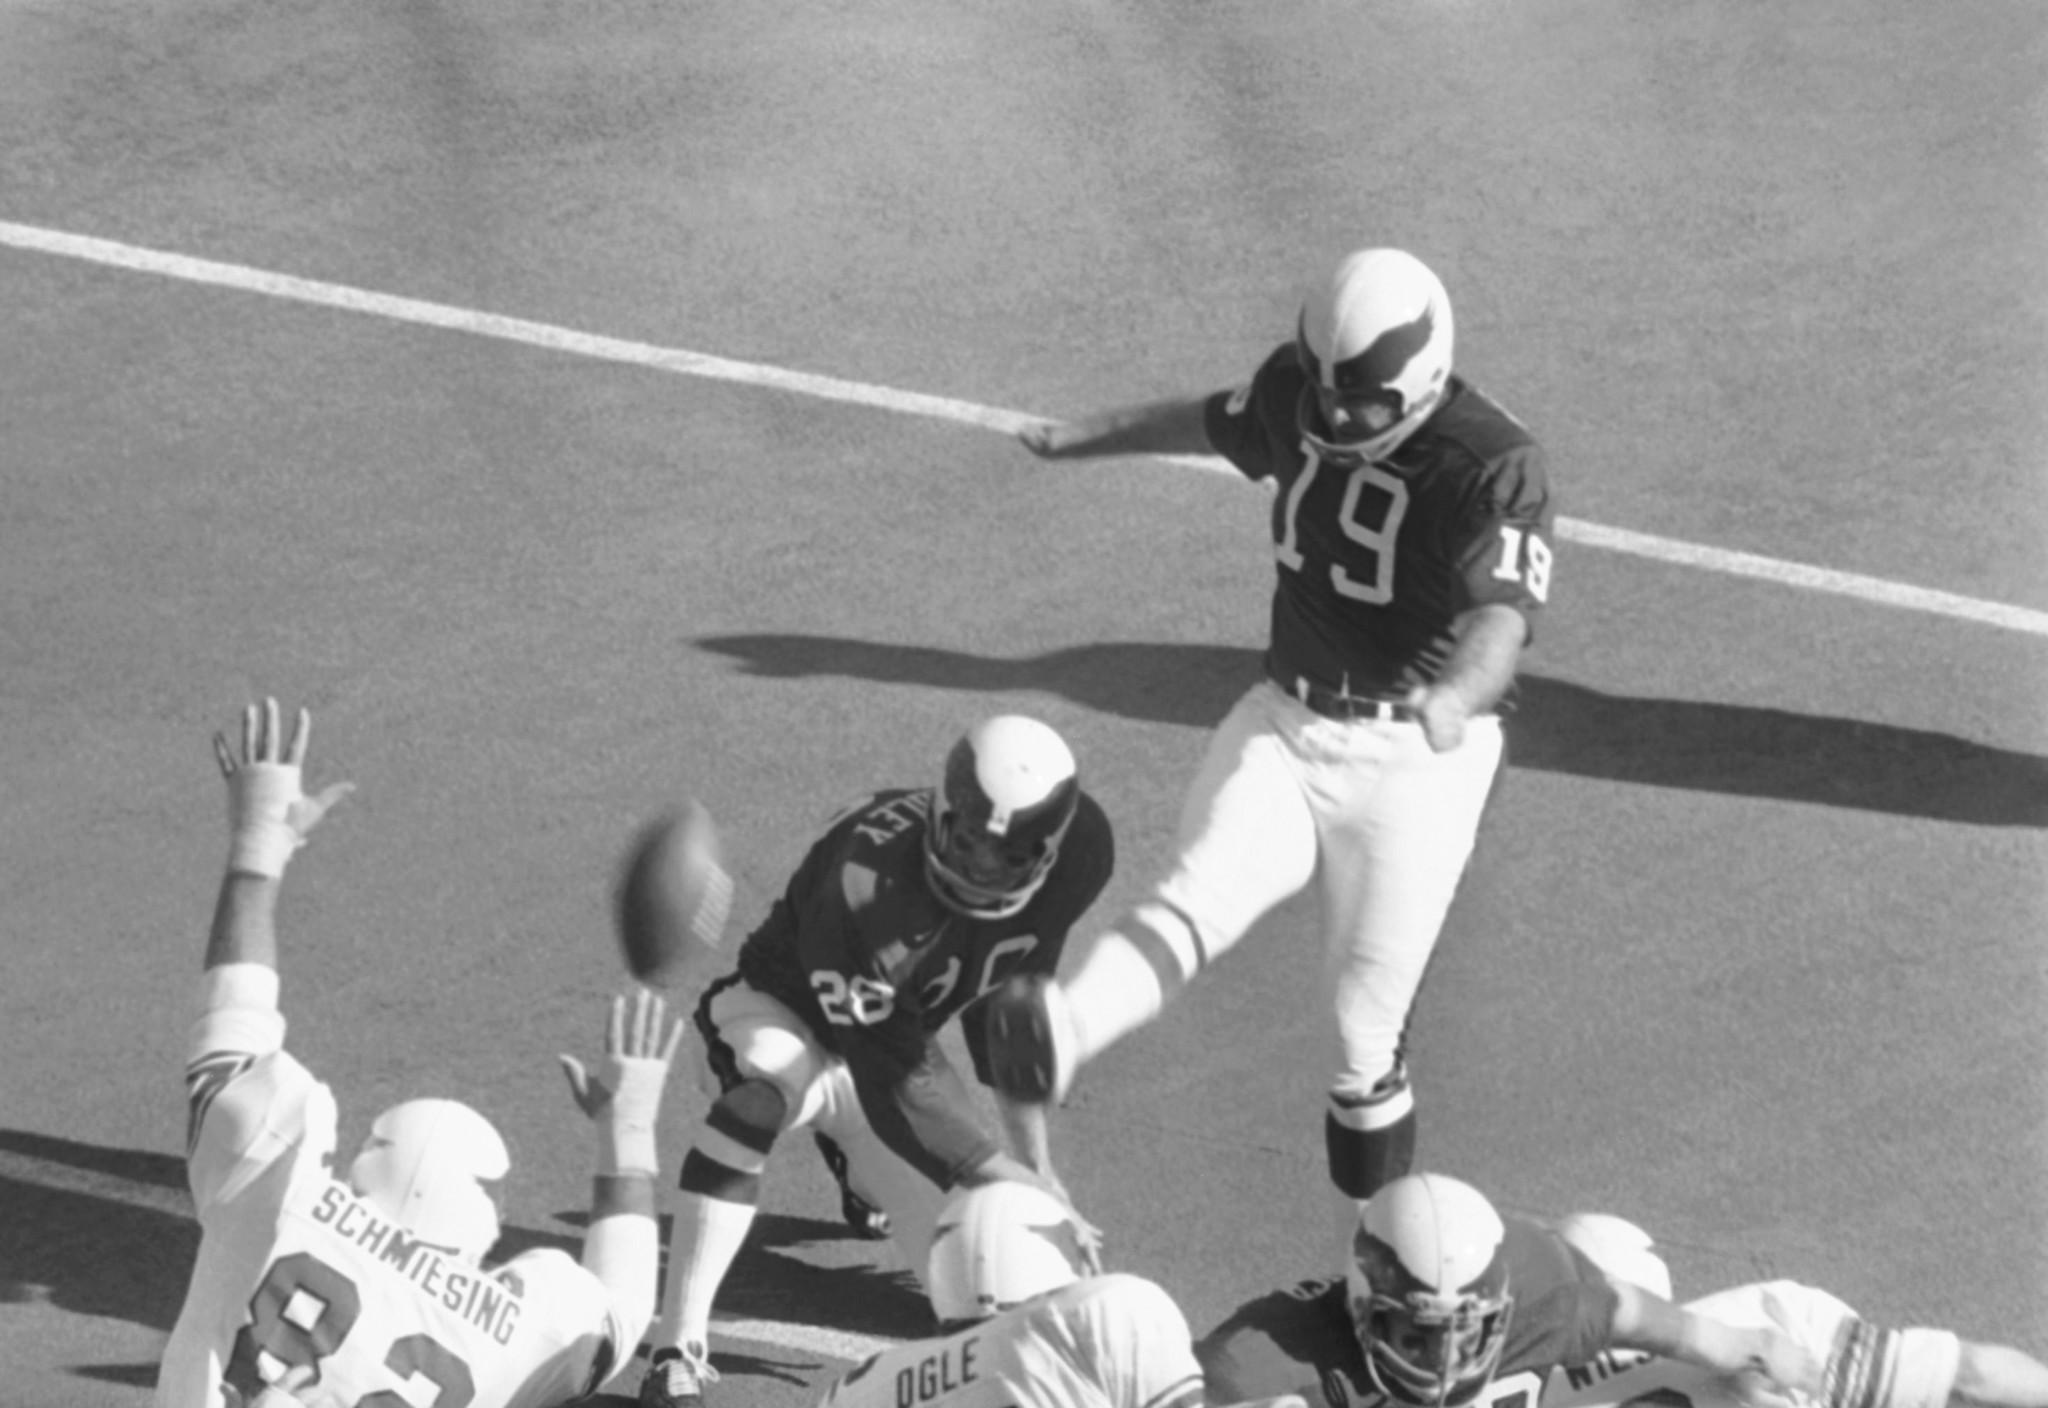 Former New Orleans Saints kicker Tom Dempsey dies from coronavirus